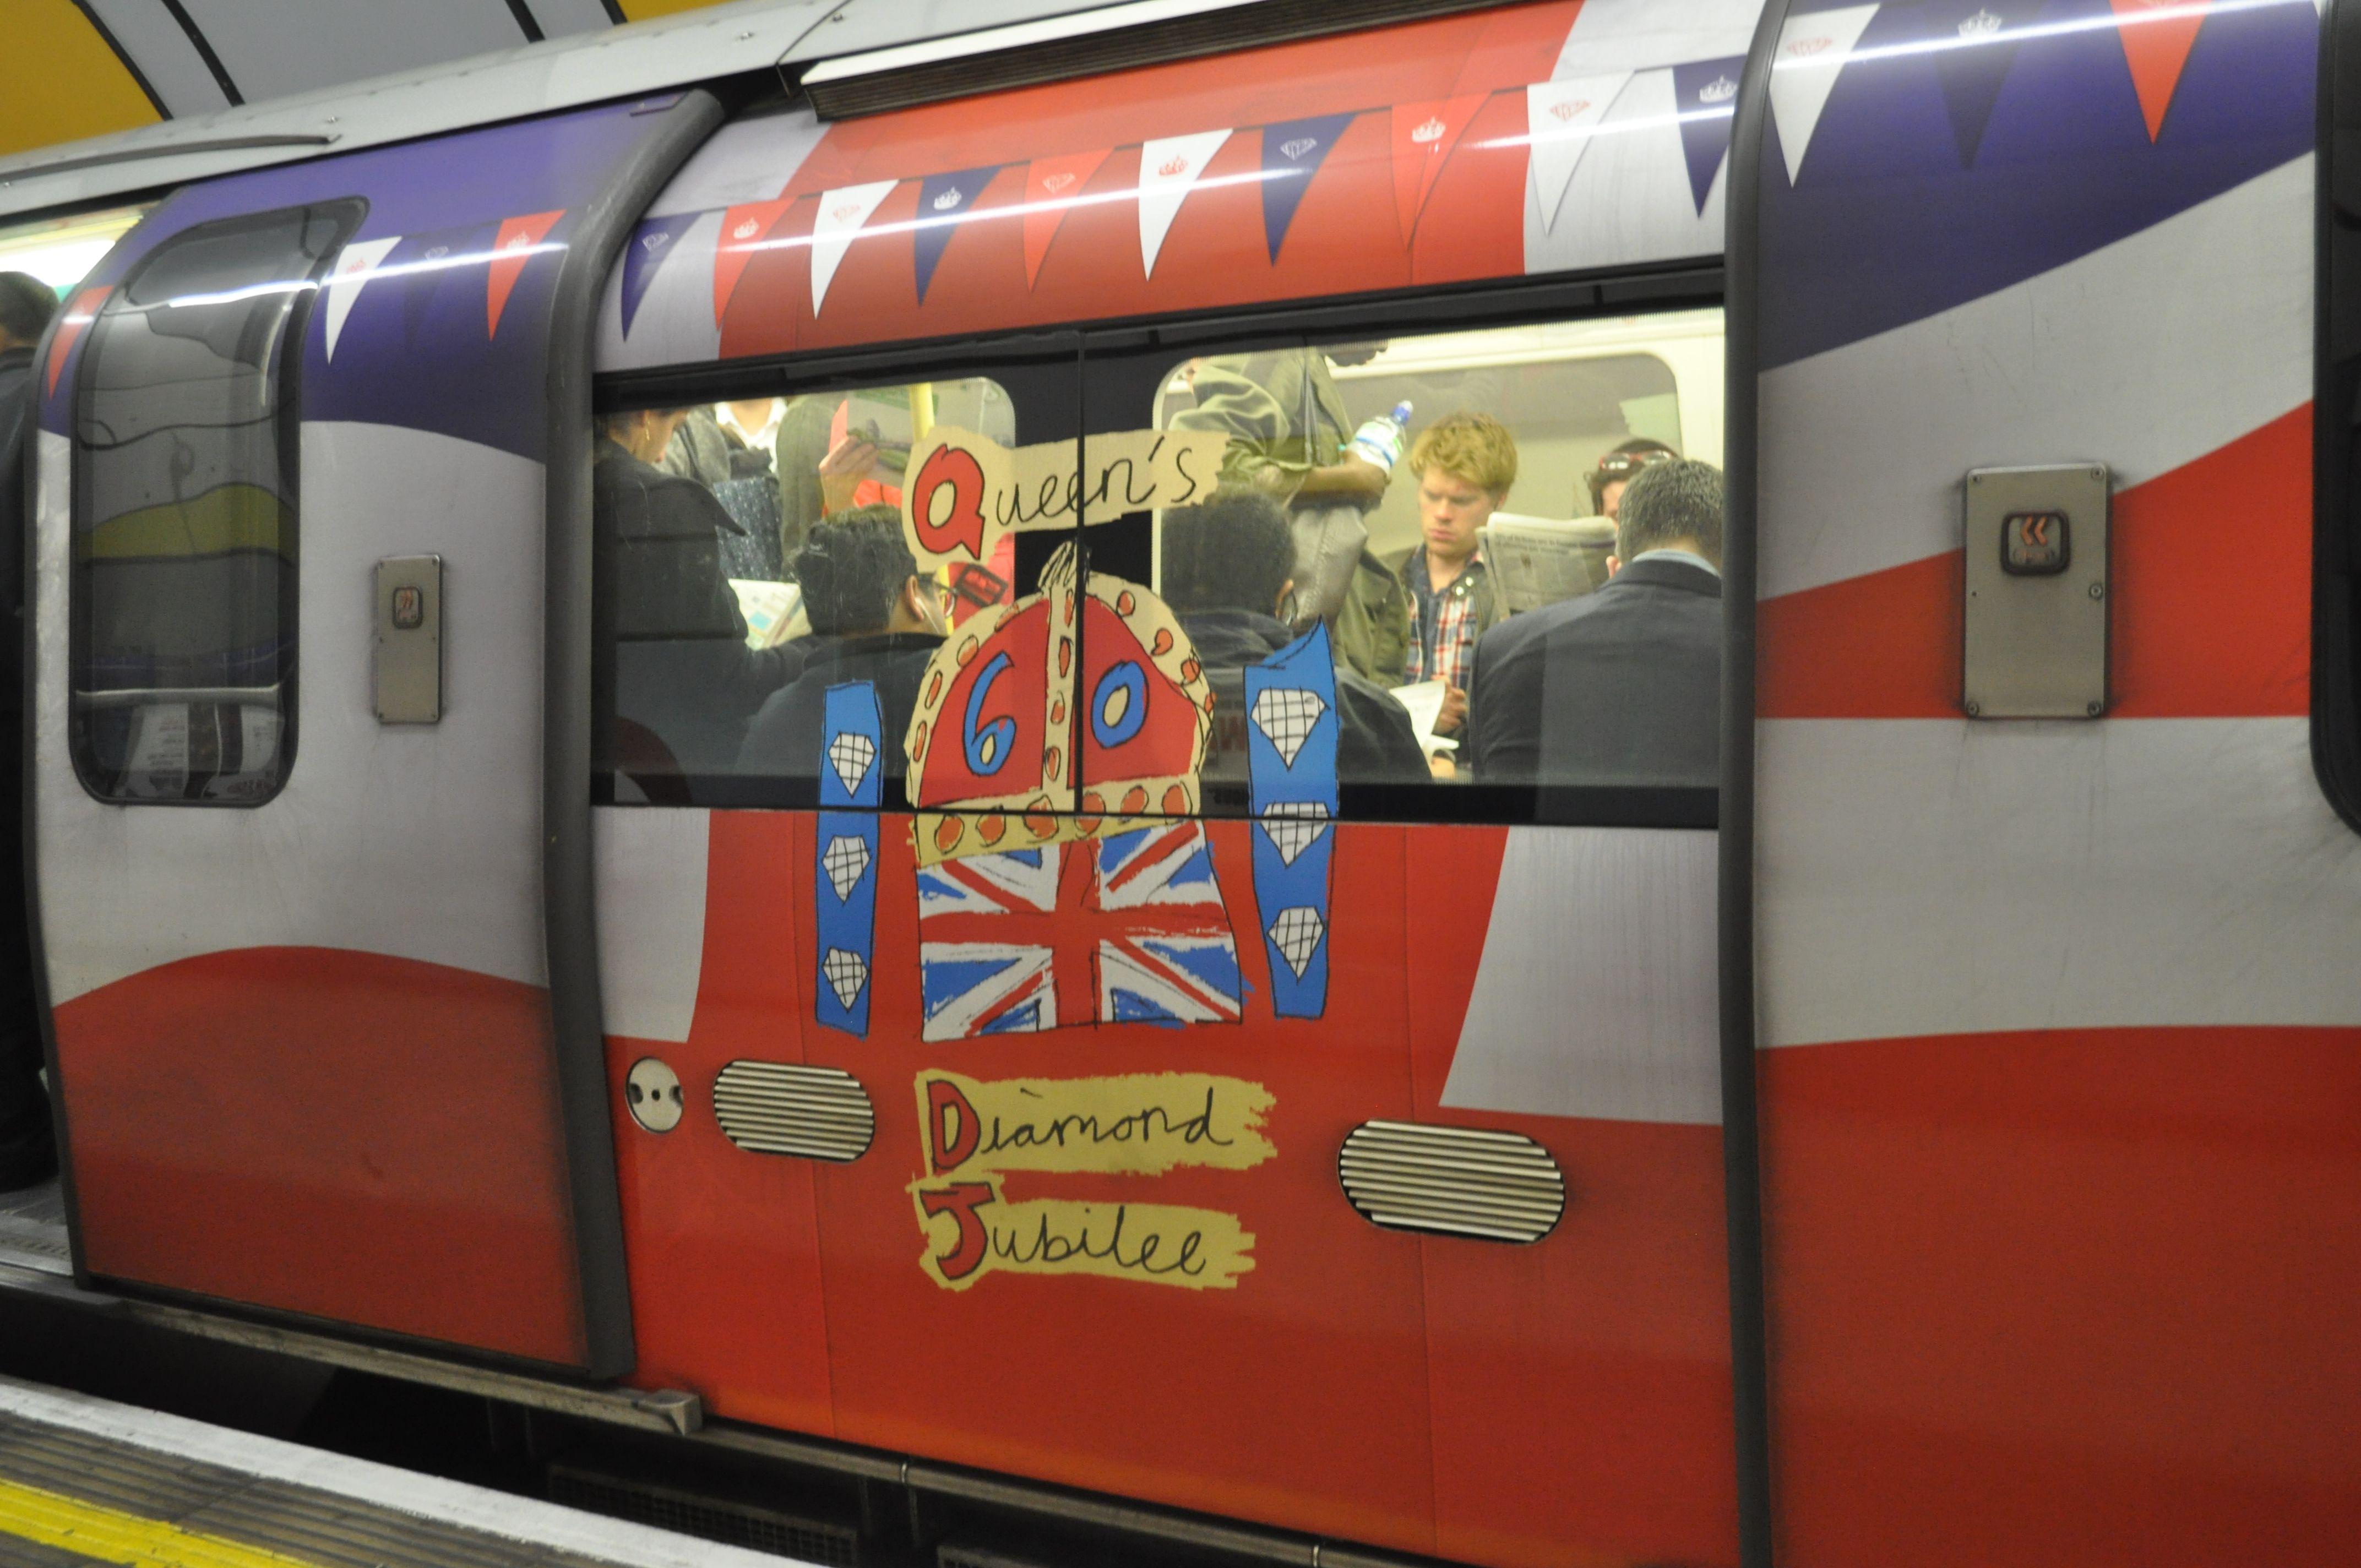 londonのtubeはとてもカラフル 旅行ガイド イギリス 鉄道 旅行